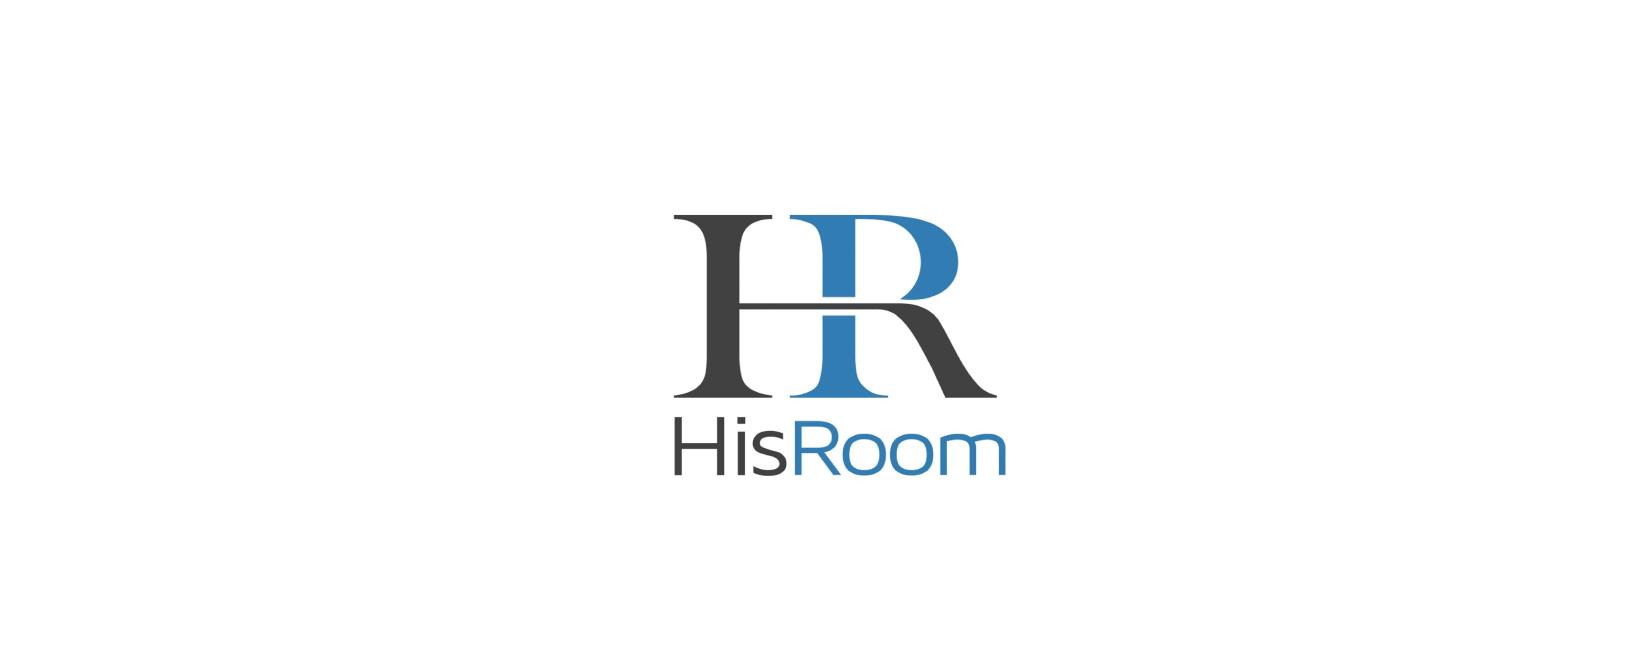 Hisroom Coupon Code 2021